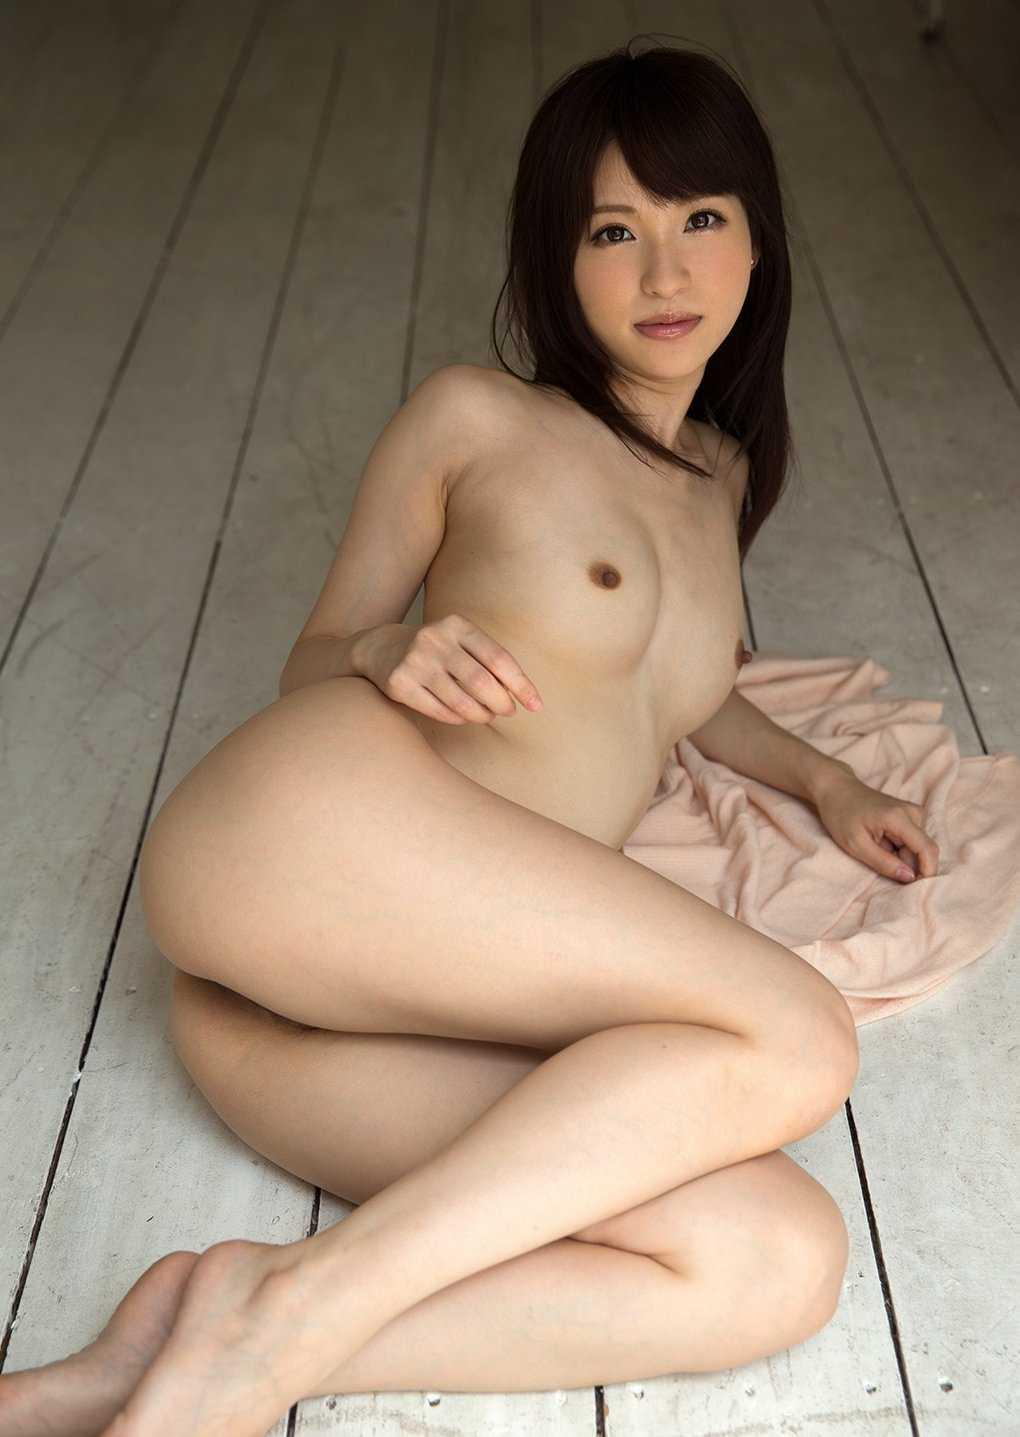 Exposed female nude